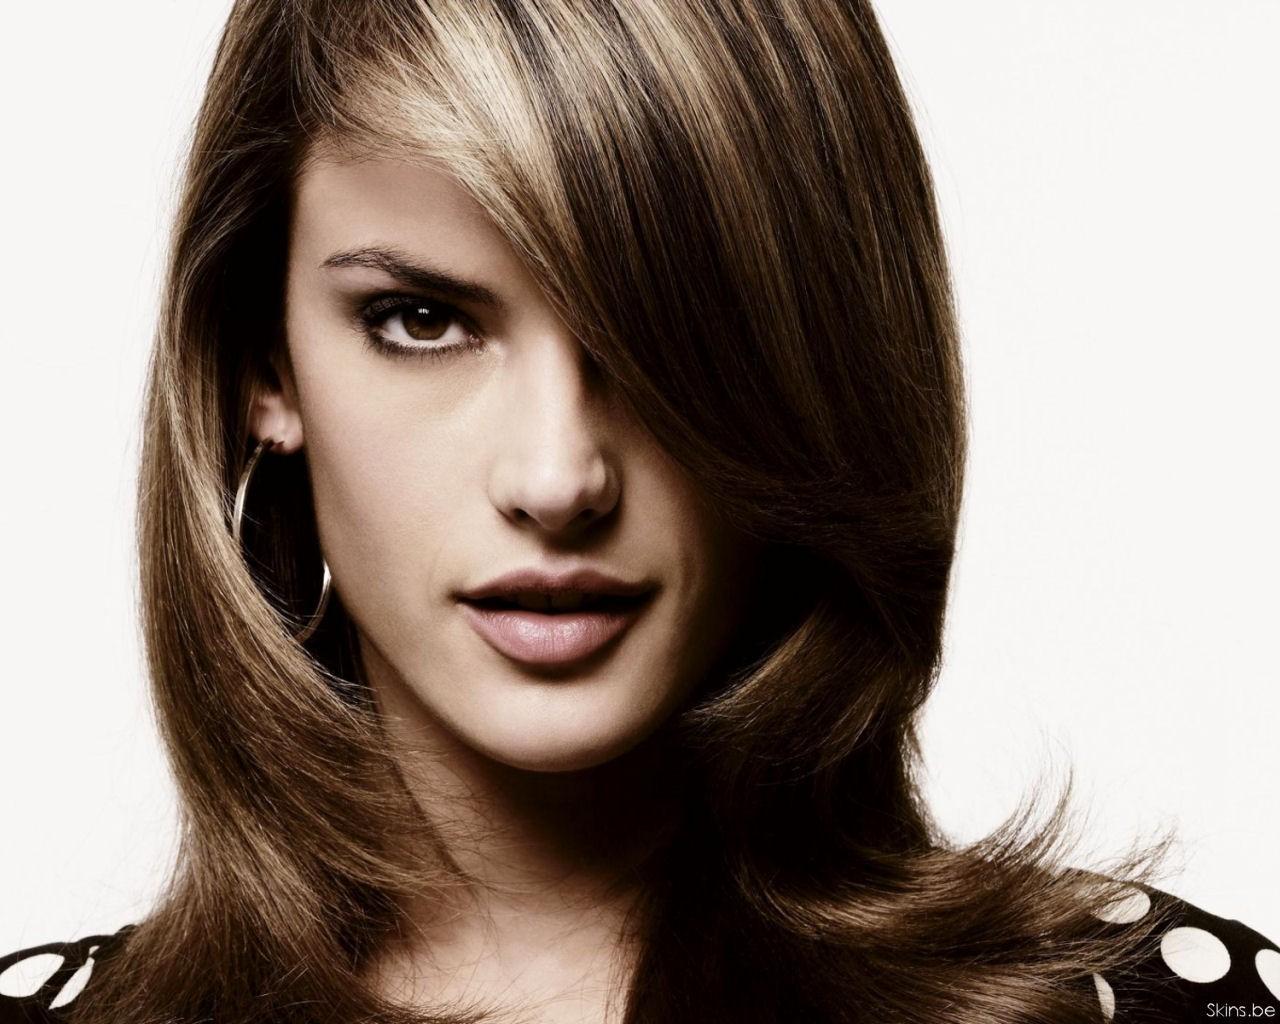 http://1.bp.blogspot.com/-01TmUK0NV-c/T0dF-WcfHvI/AAAAAAAAAhM/q1WQzdSQZPo/s1600/alessandra-ambrosio-hairstyle-wallpaper.jpg